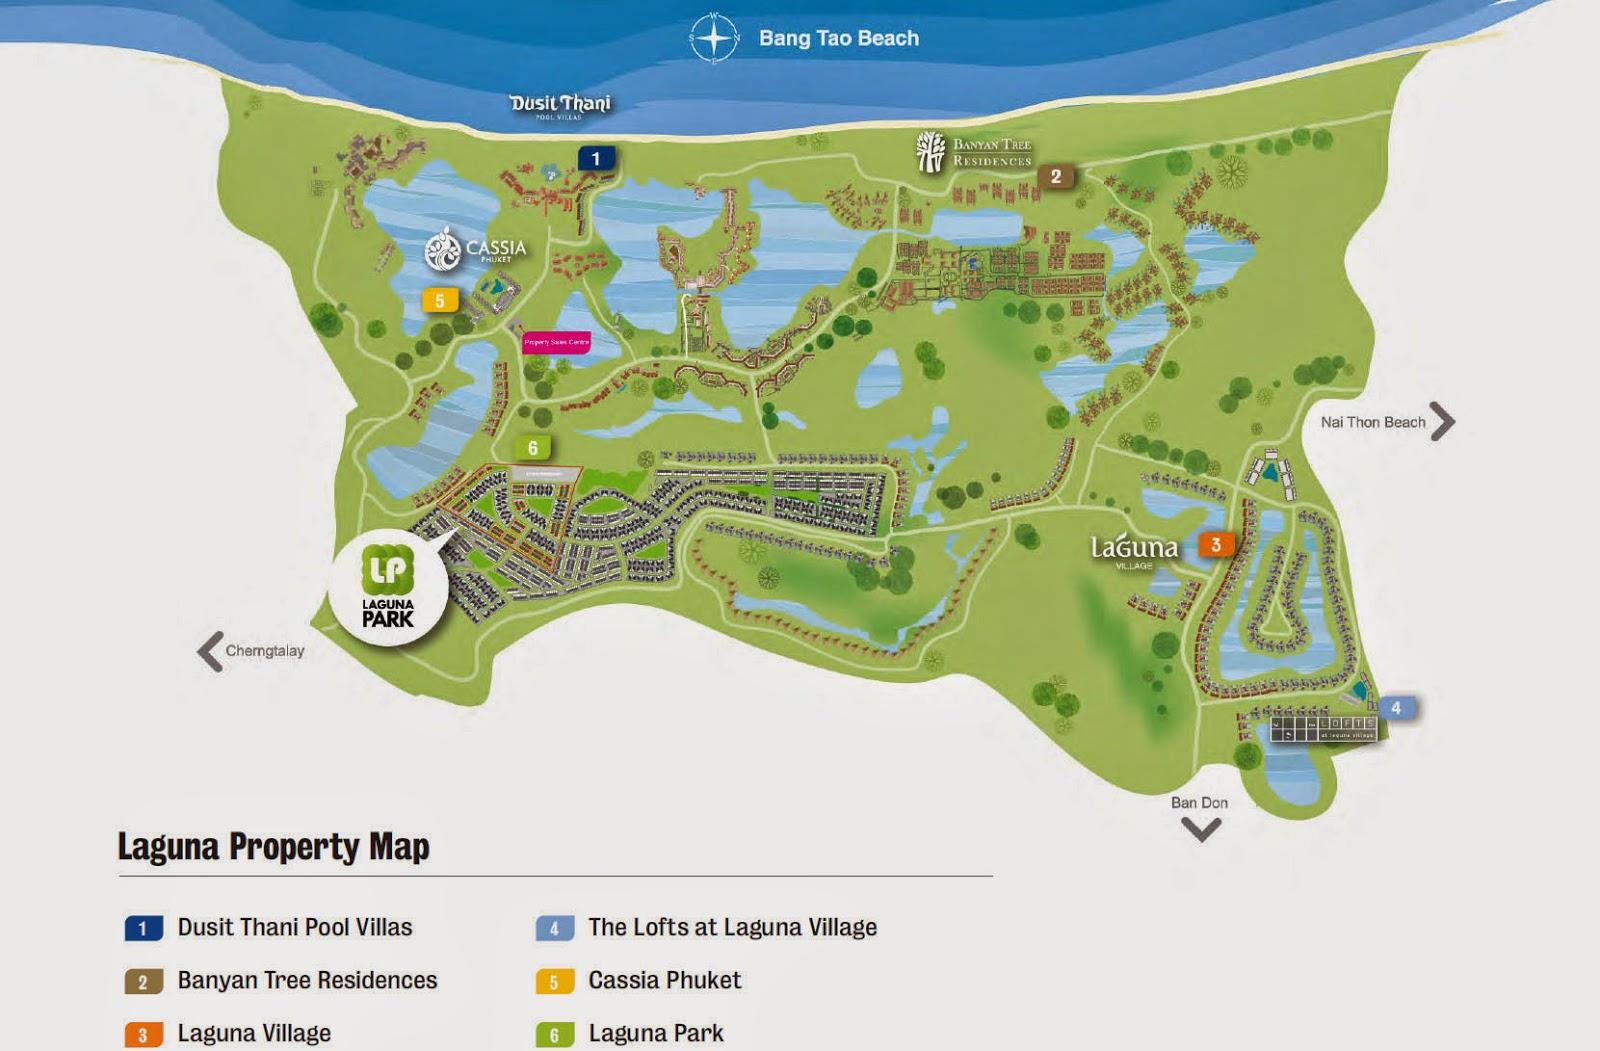 Laguna Park-Phuket-Condo-Apartments Map laguna park @ phuket condo Laguna Park @ Phuket | Showflat Hotline 61007122 Laguna Park Location site